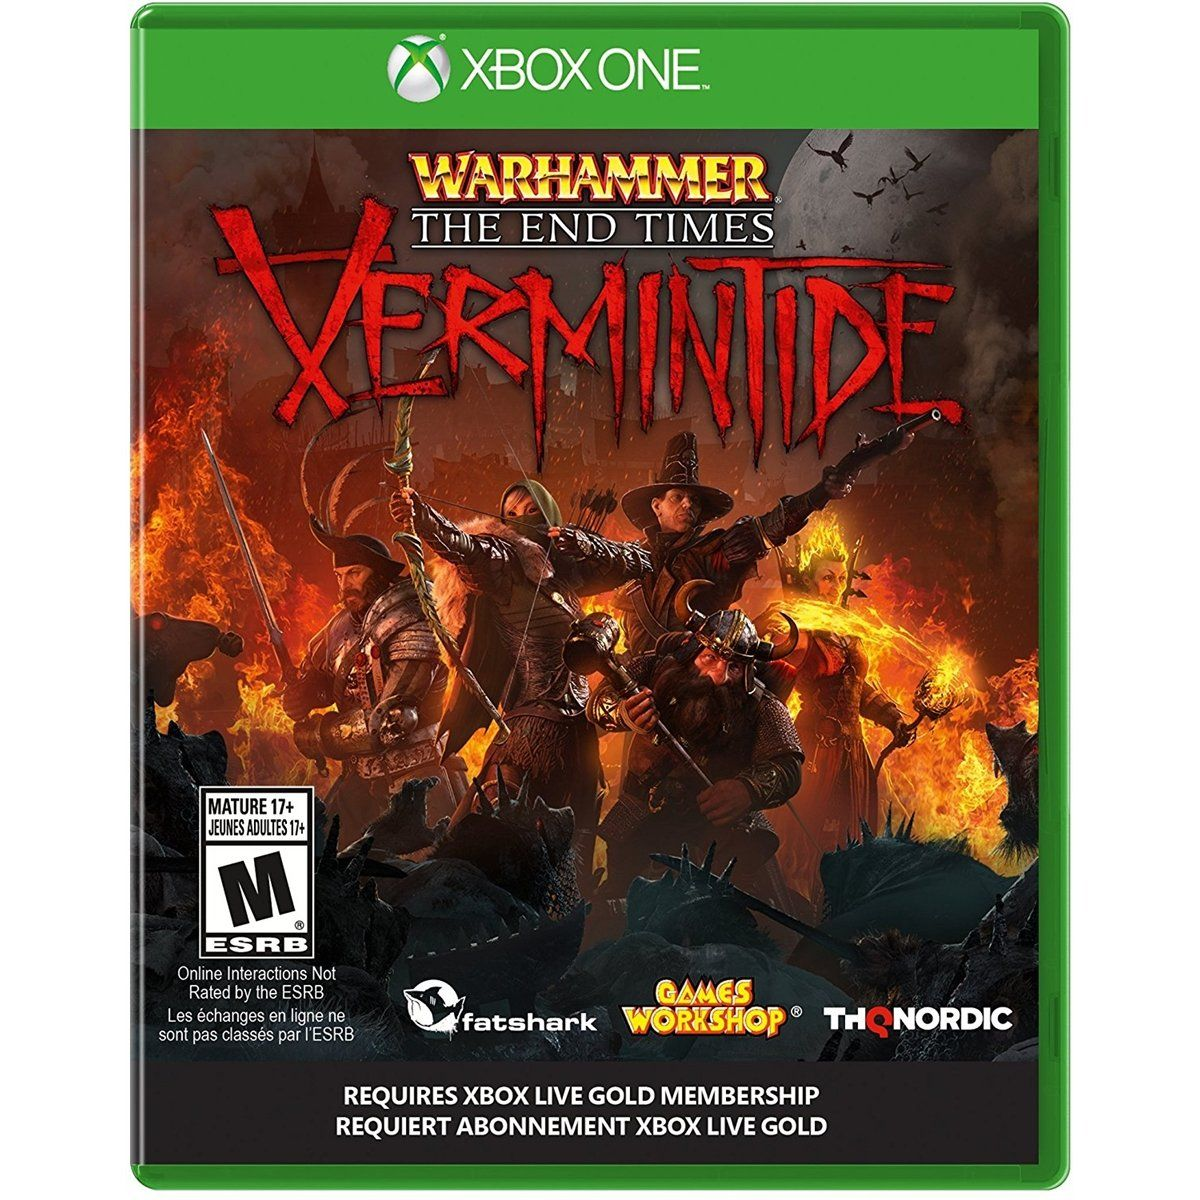 Jogo P/ Xbox One Warhammer The End Times Xermintide Midia Fisica